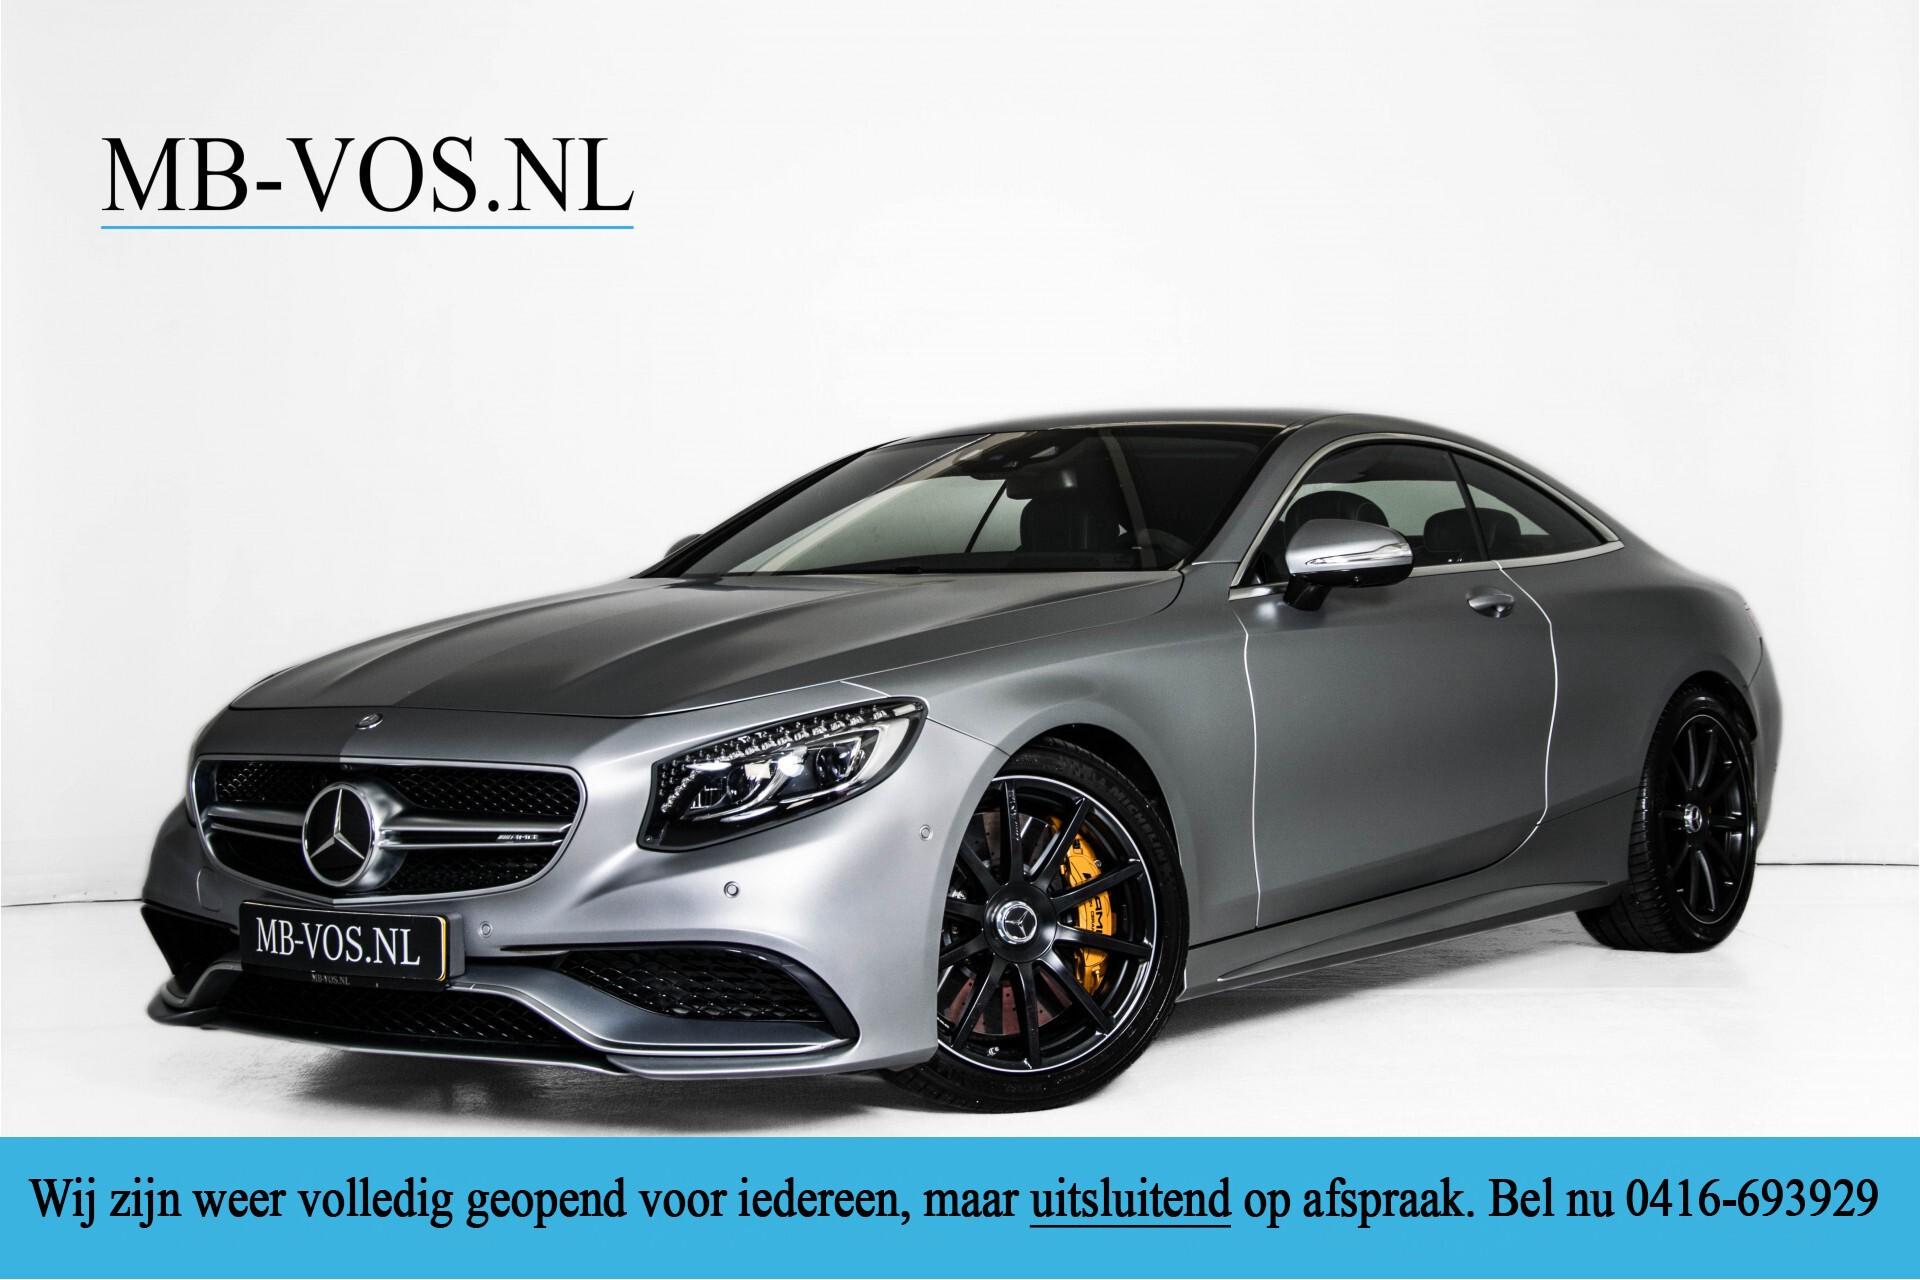 Mercedes-Benz S-Klasse Coupé 63 AMG 4-M Keramisch/Akrapovic/Swarowski/Designo/Burmester High End Aut7 Foto 1